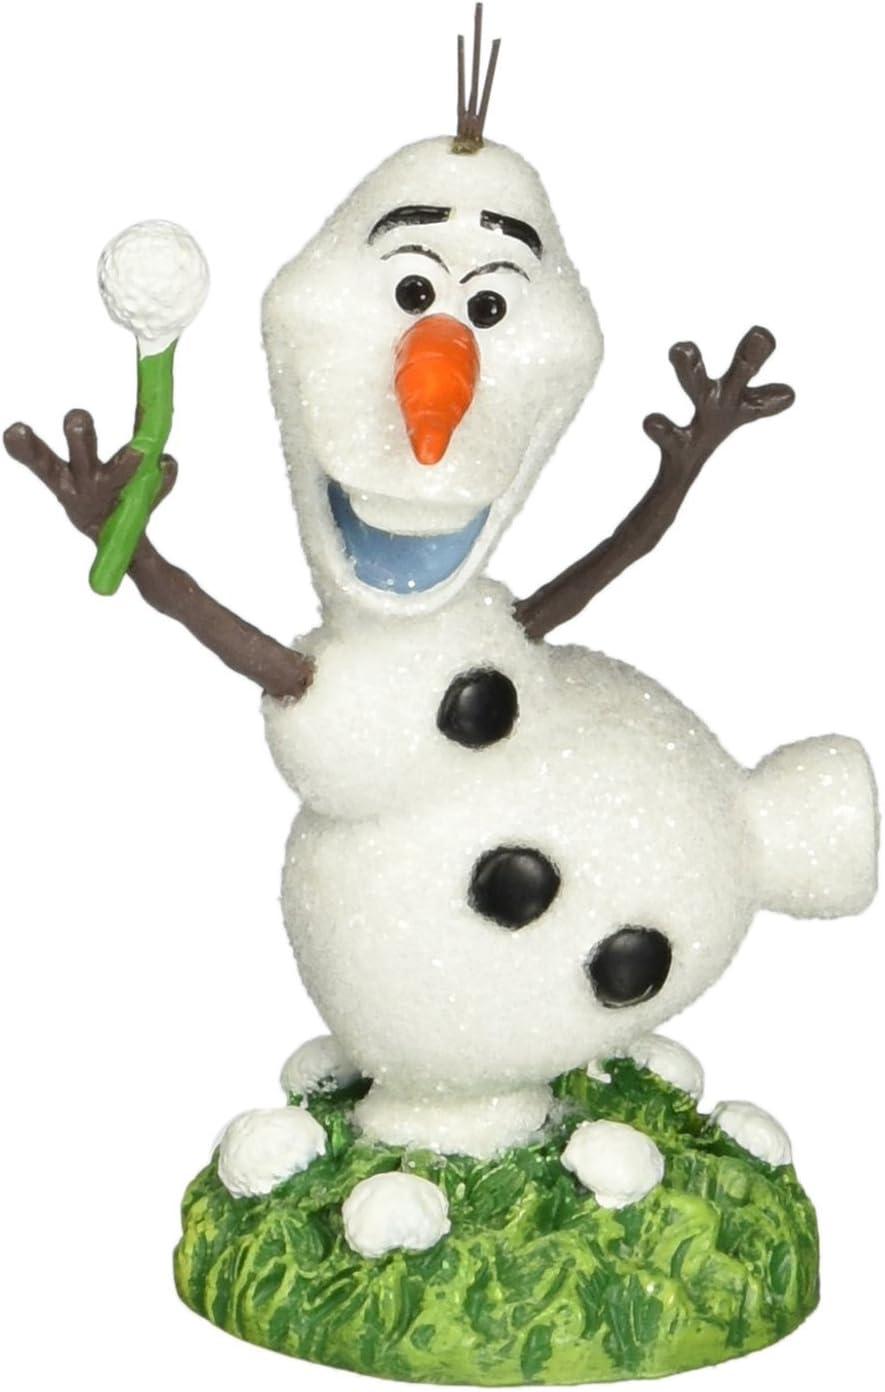 Department 56 Disney Village Frozen Olaf in Summer Accessory Figurine